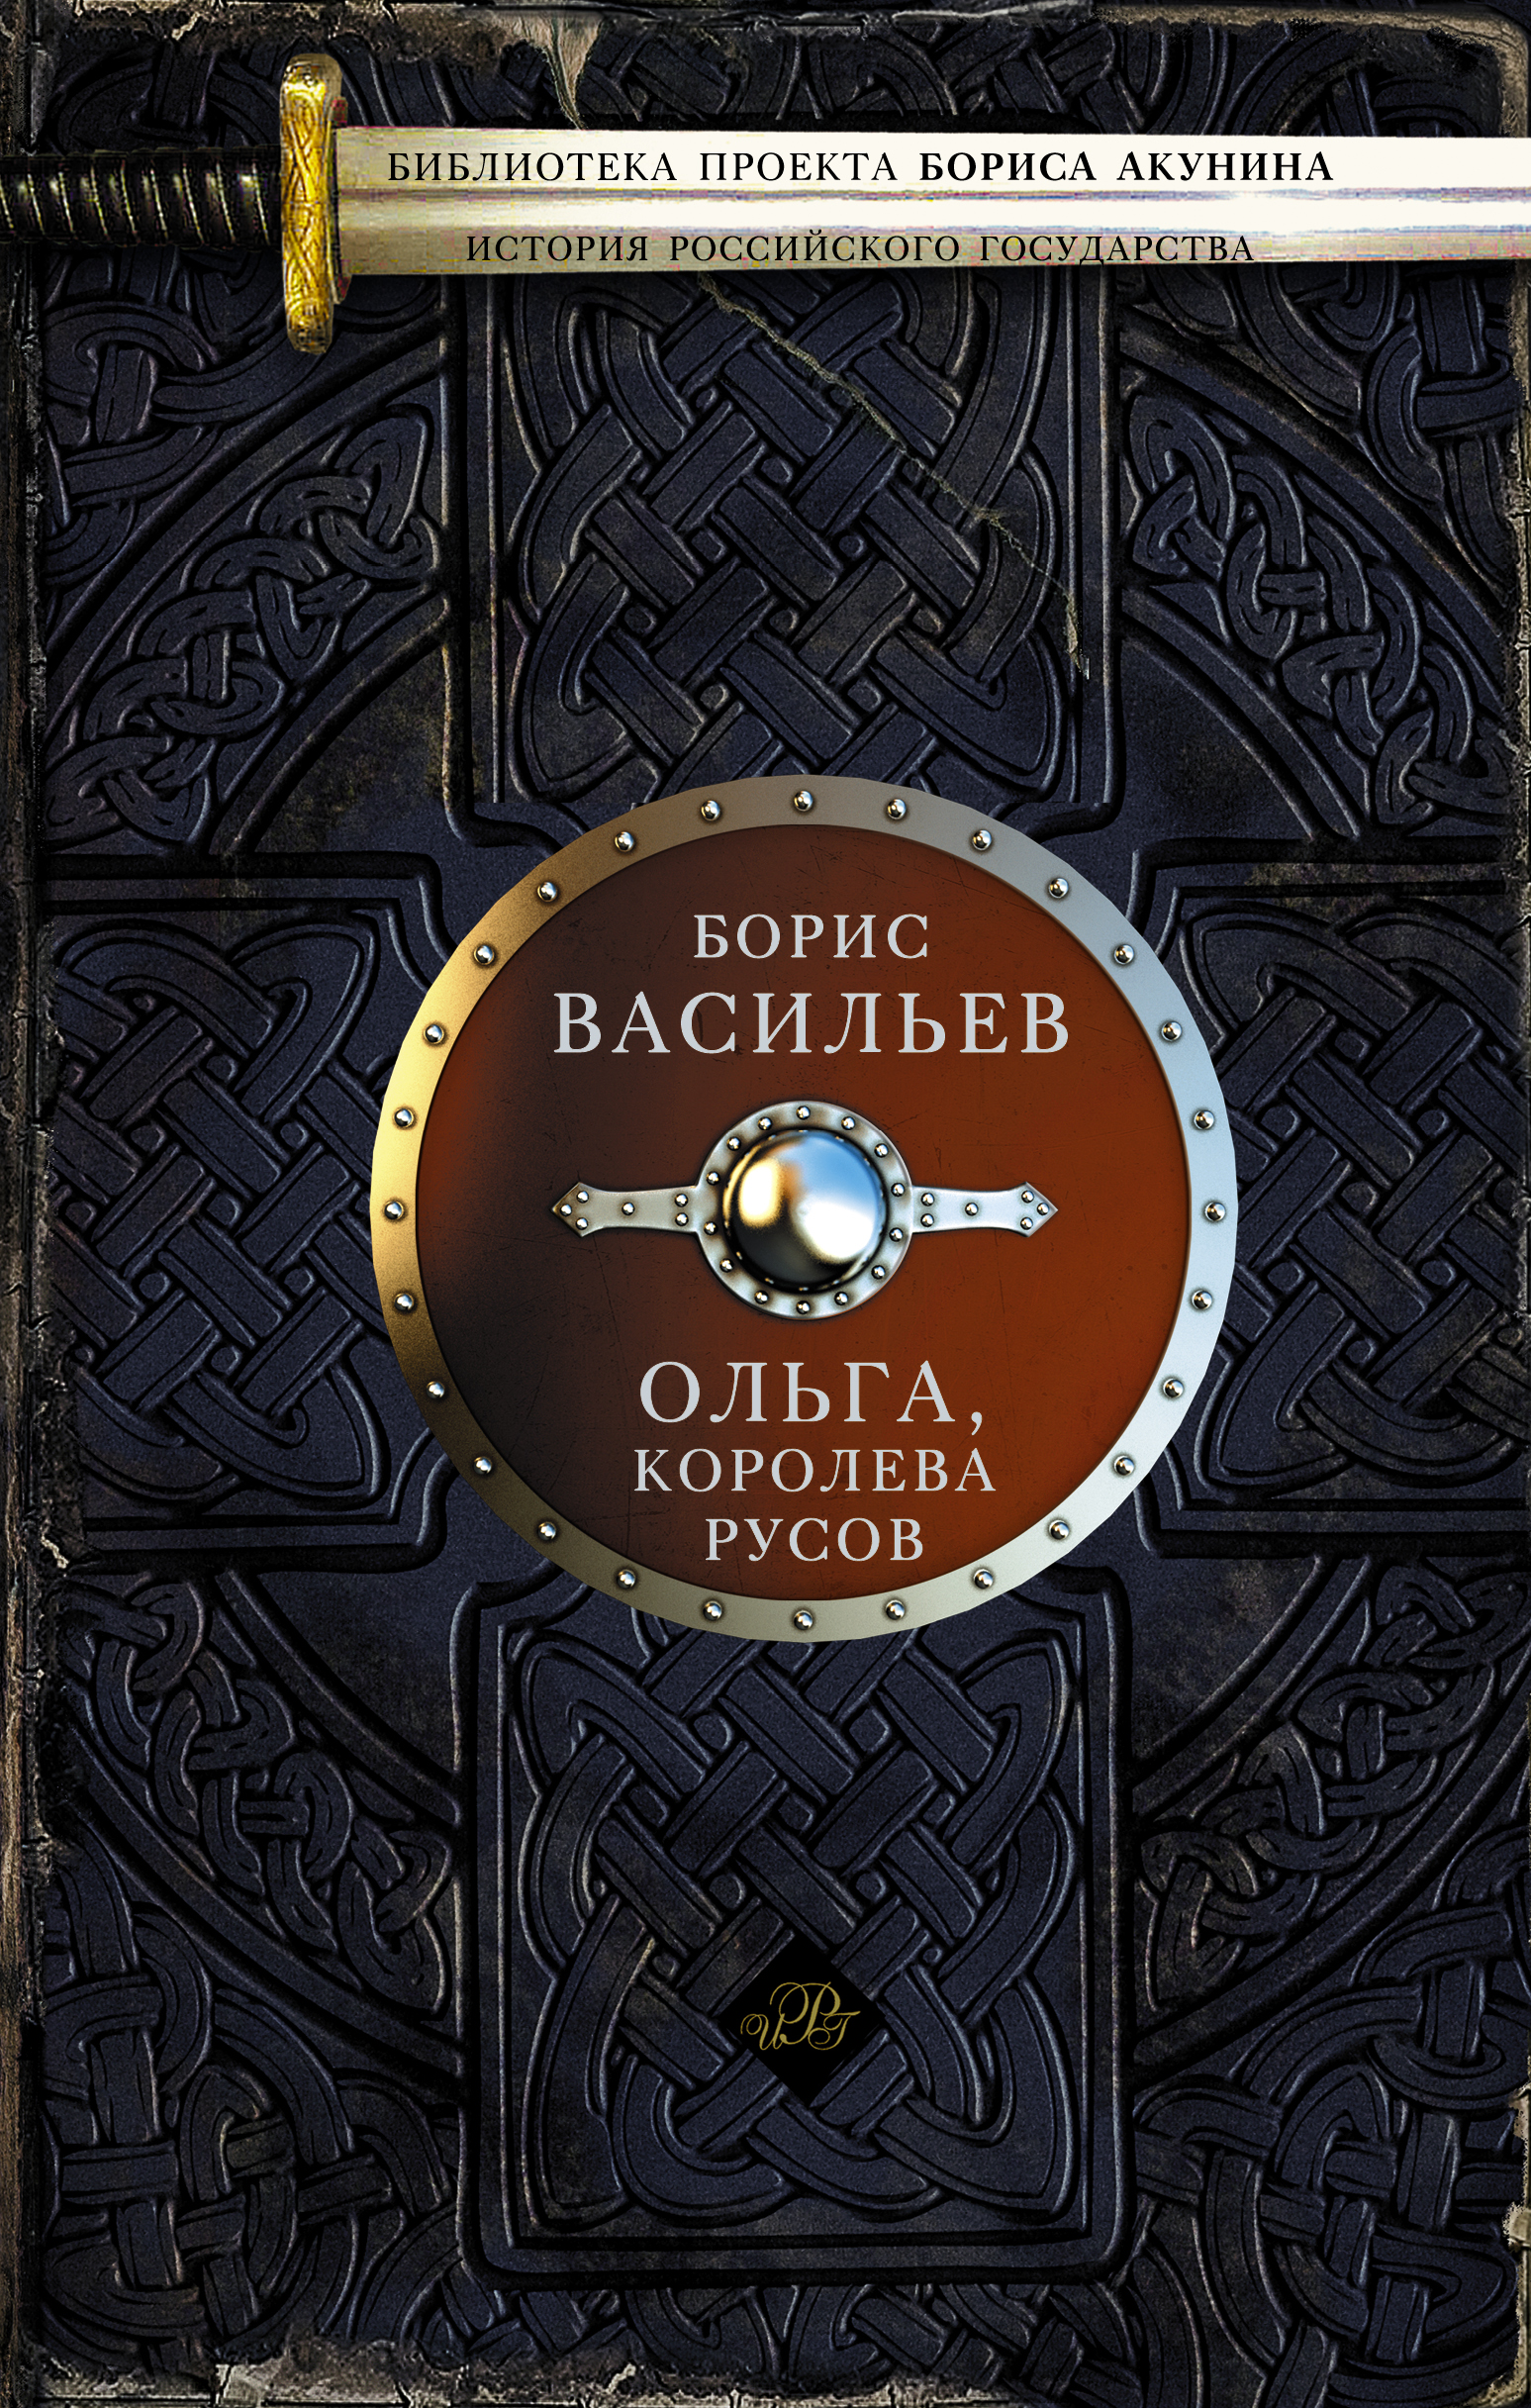 Ольга, королева русов ( Васильев Б.Л.  )